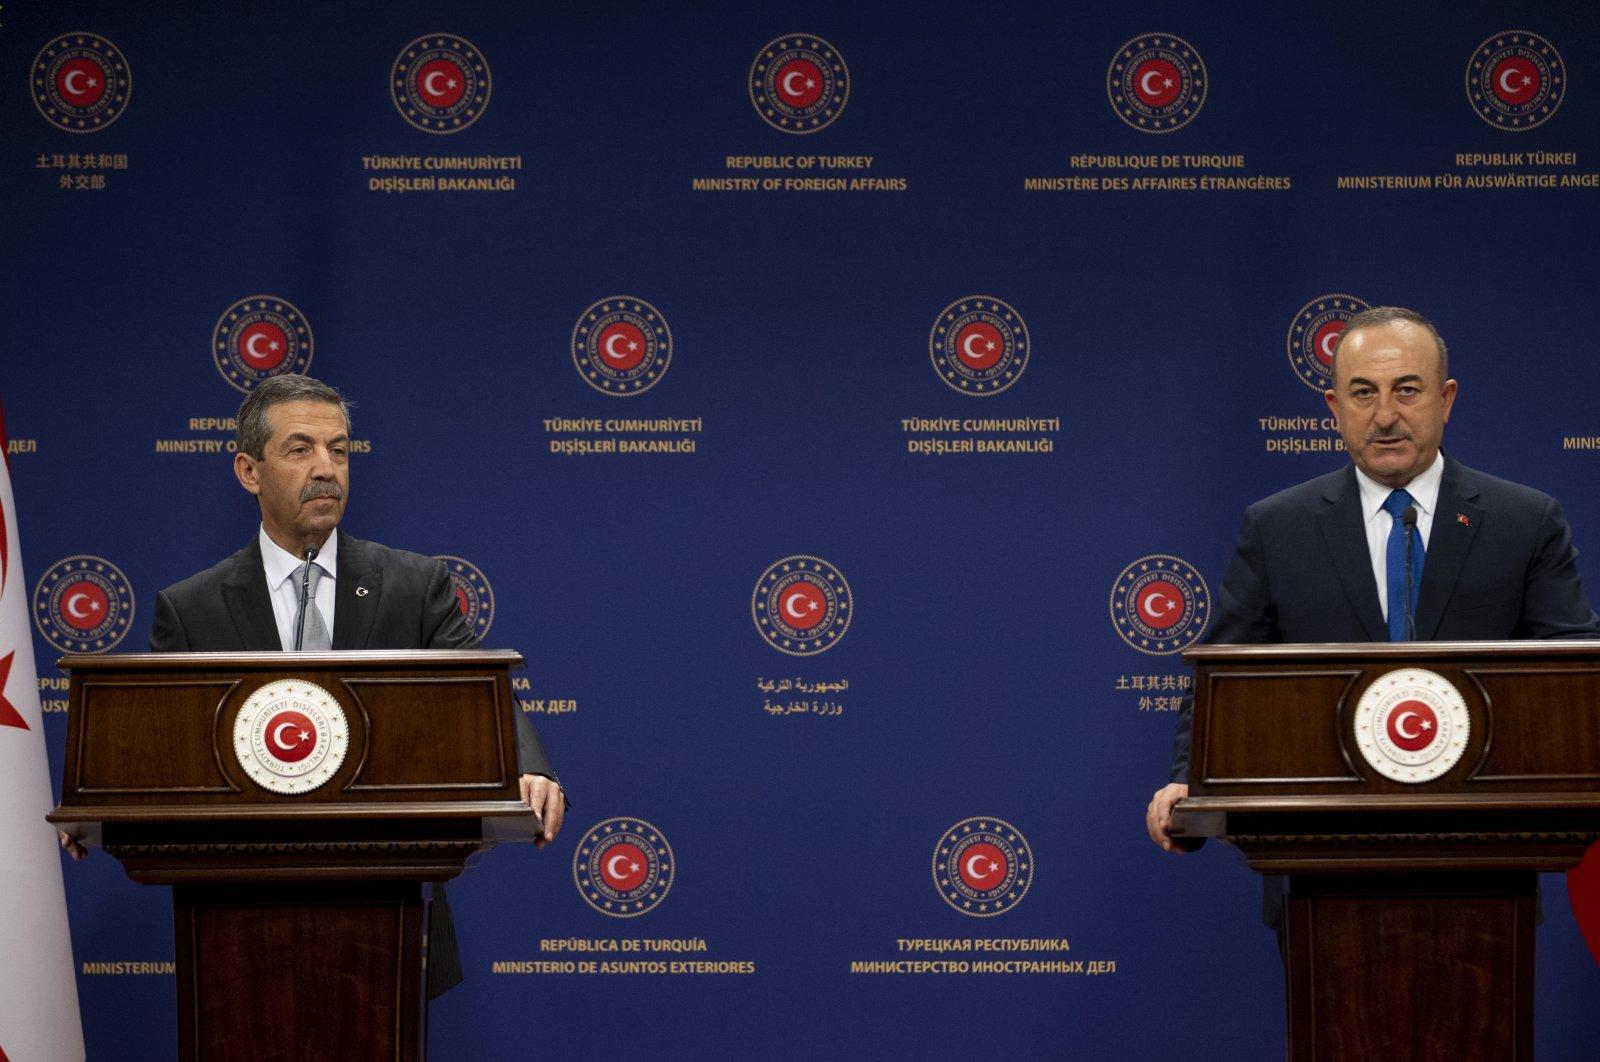 Foreign Minister Mevlüt Çavuşoğlu (R) and his Turkish Cypriot counterpart Tahsin Ertuğruloğlu speak during a joint press conference in the capital Ankara, Jan. 11, 2021. (AA Photo)